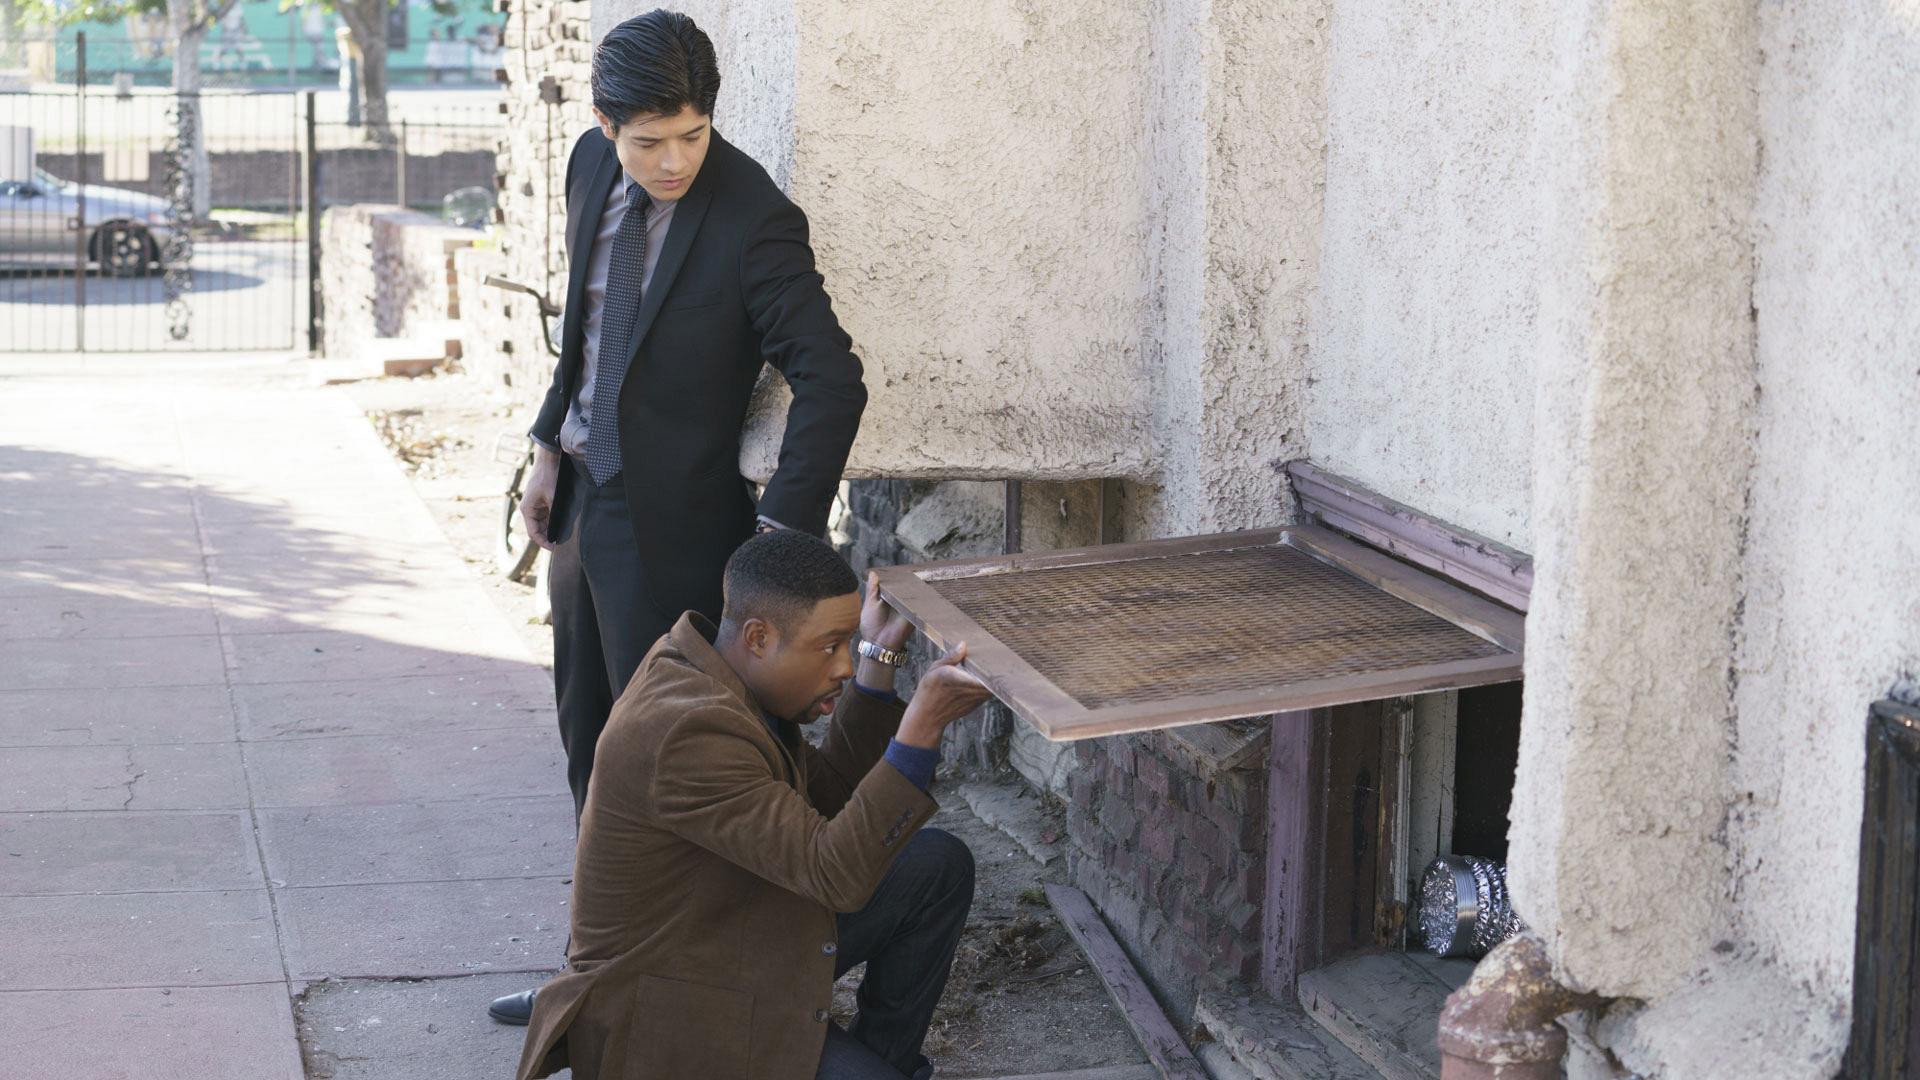 The detectives discovered a drug cartel.